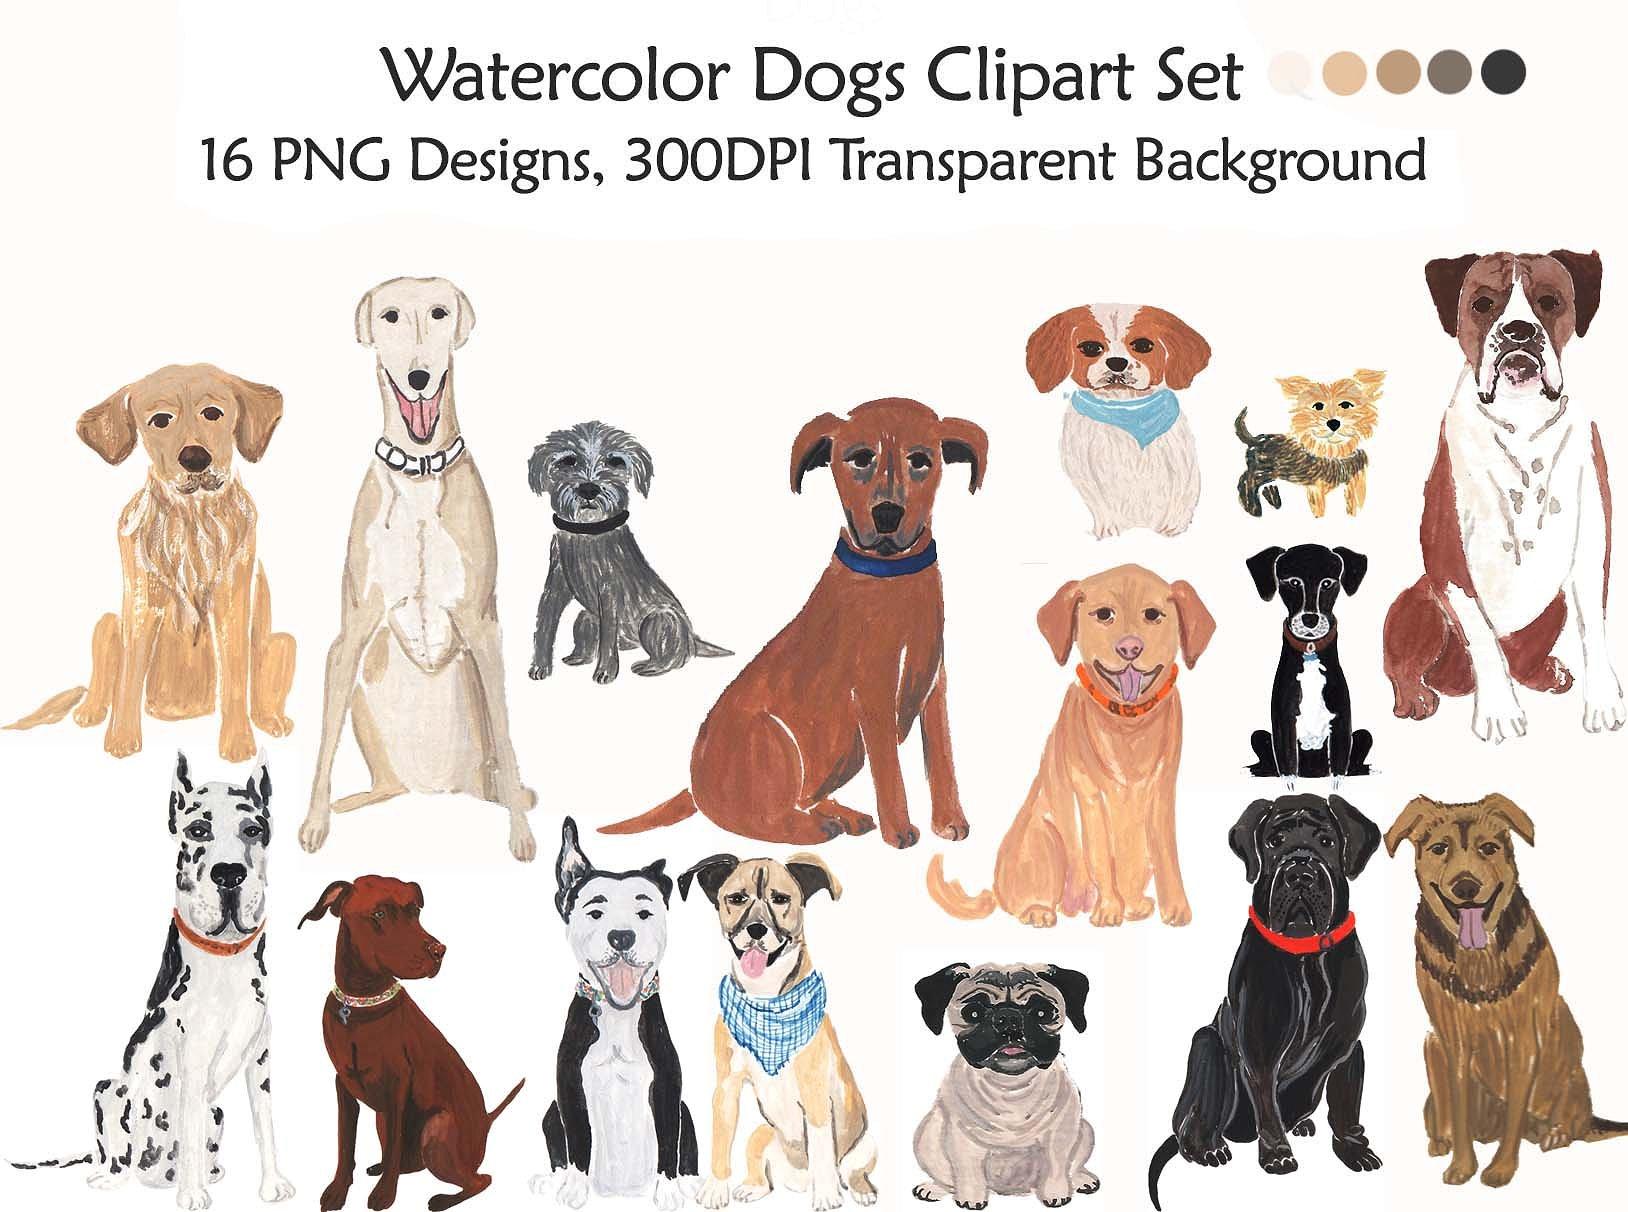 Handmade illustration illustrations creative. Clipart dogs